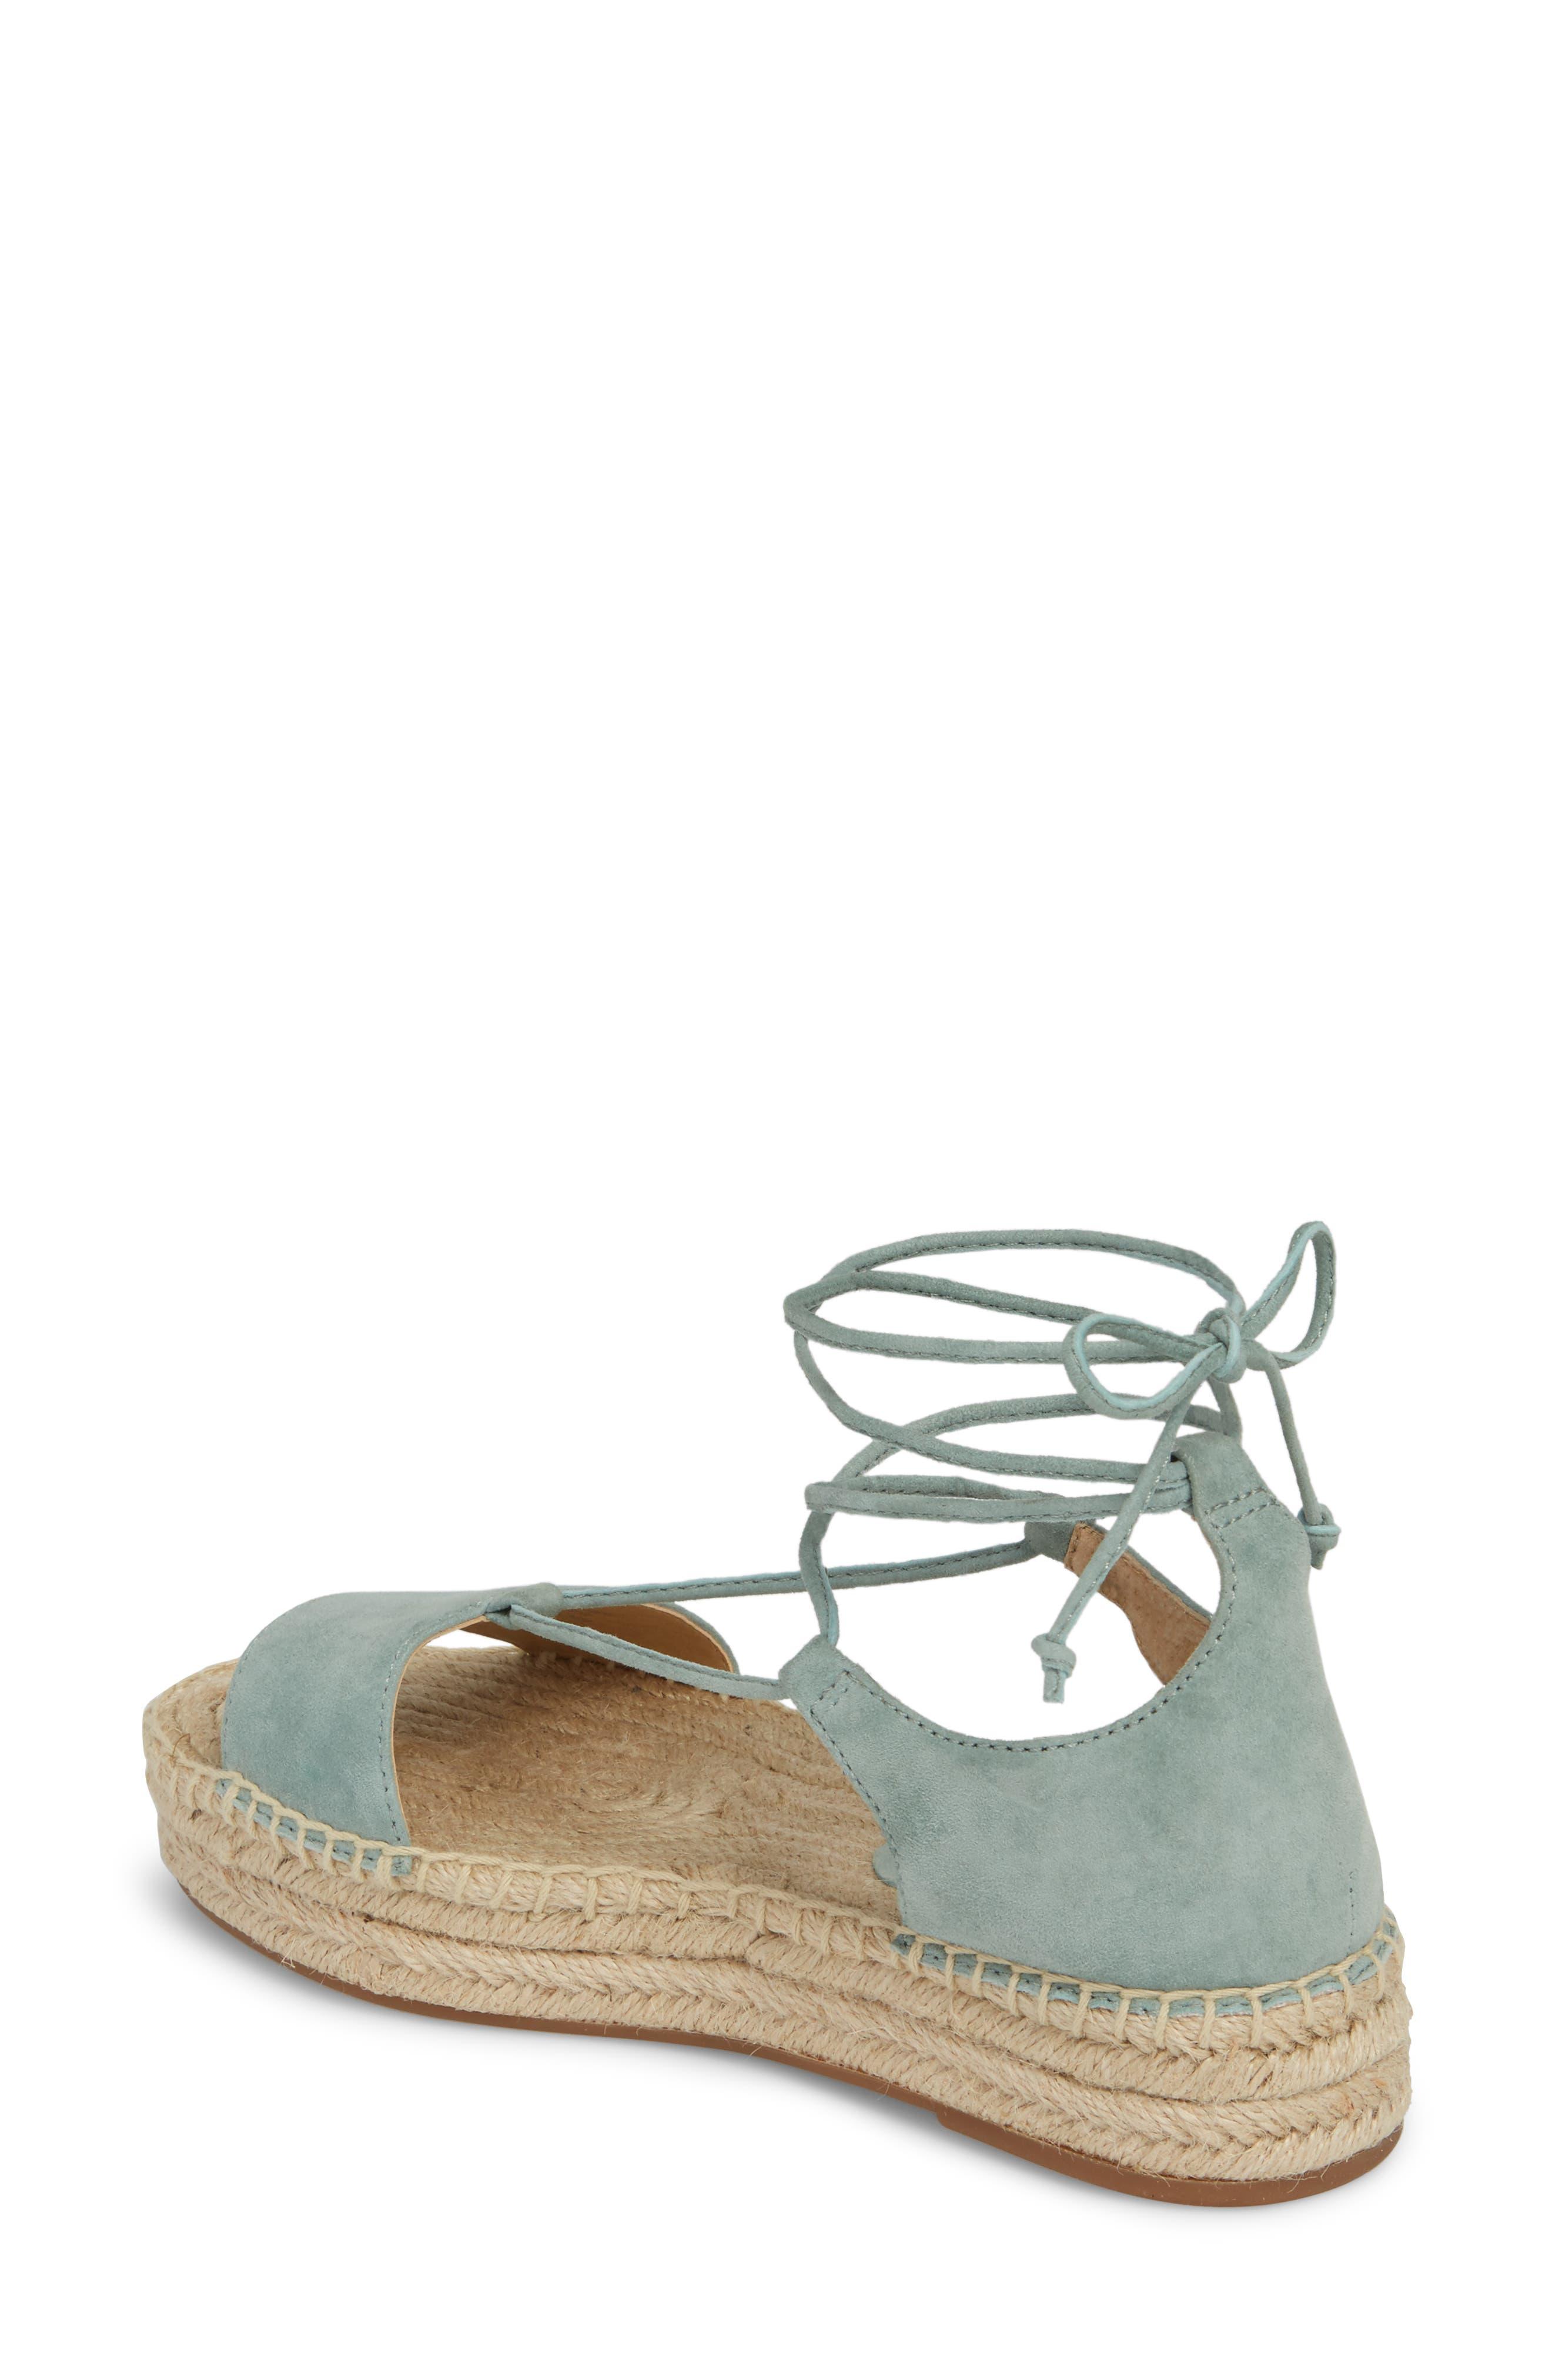 Fernanda Wraparound Platform Sandal,                             Alternate thumbnail 2, color,                             Deco Green Suede